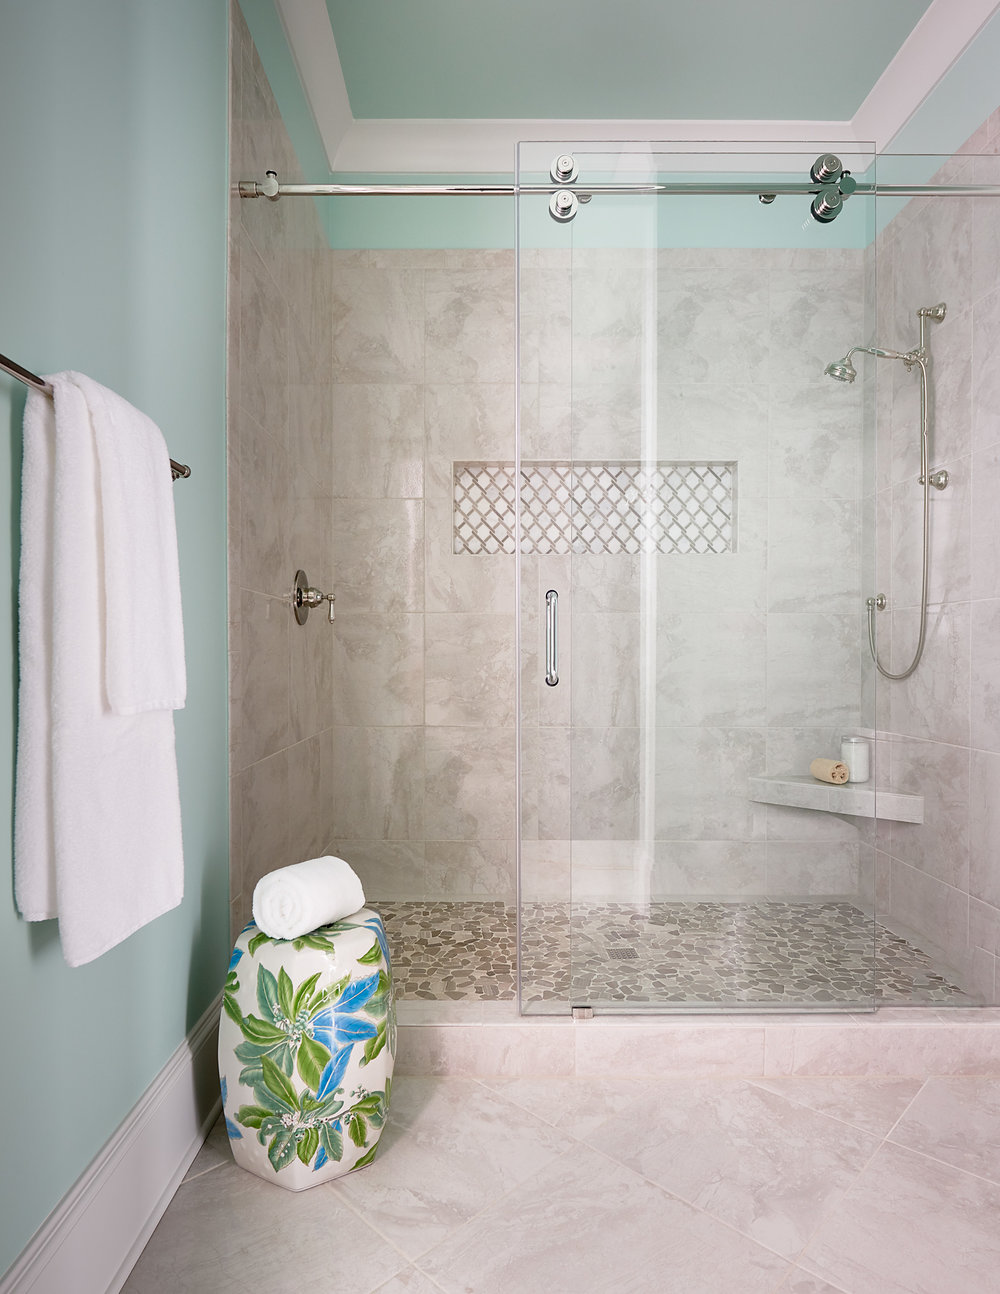 WSHID - Guest Bath - Sliding Shower Doors.jpg